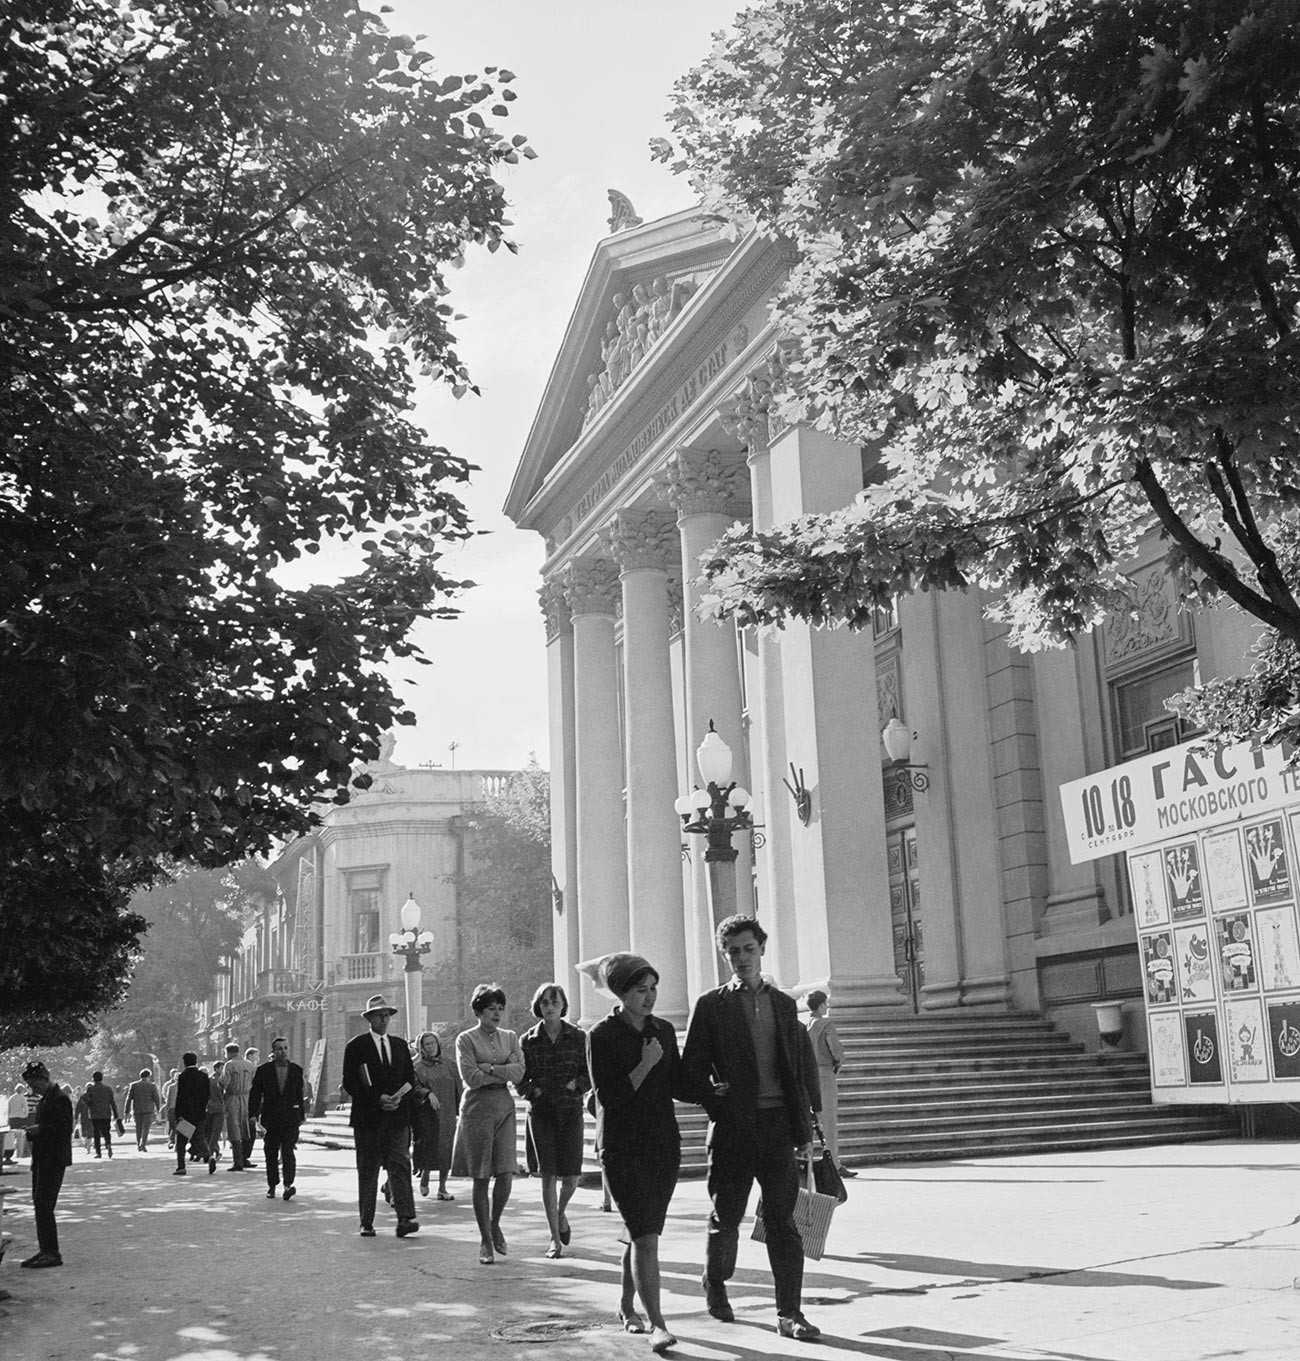 A.S. Pushkin Moldavian State Music and Drama Theater on Lenin Avenue, Chisinau, 1960s.